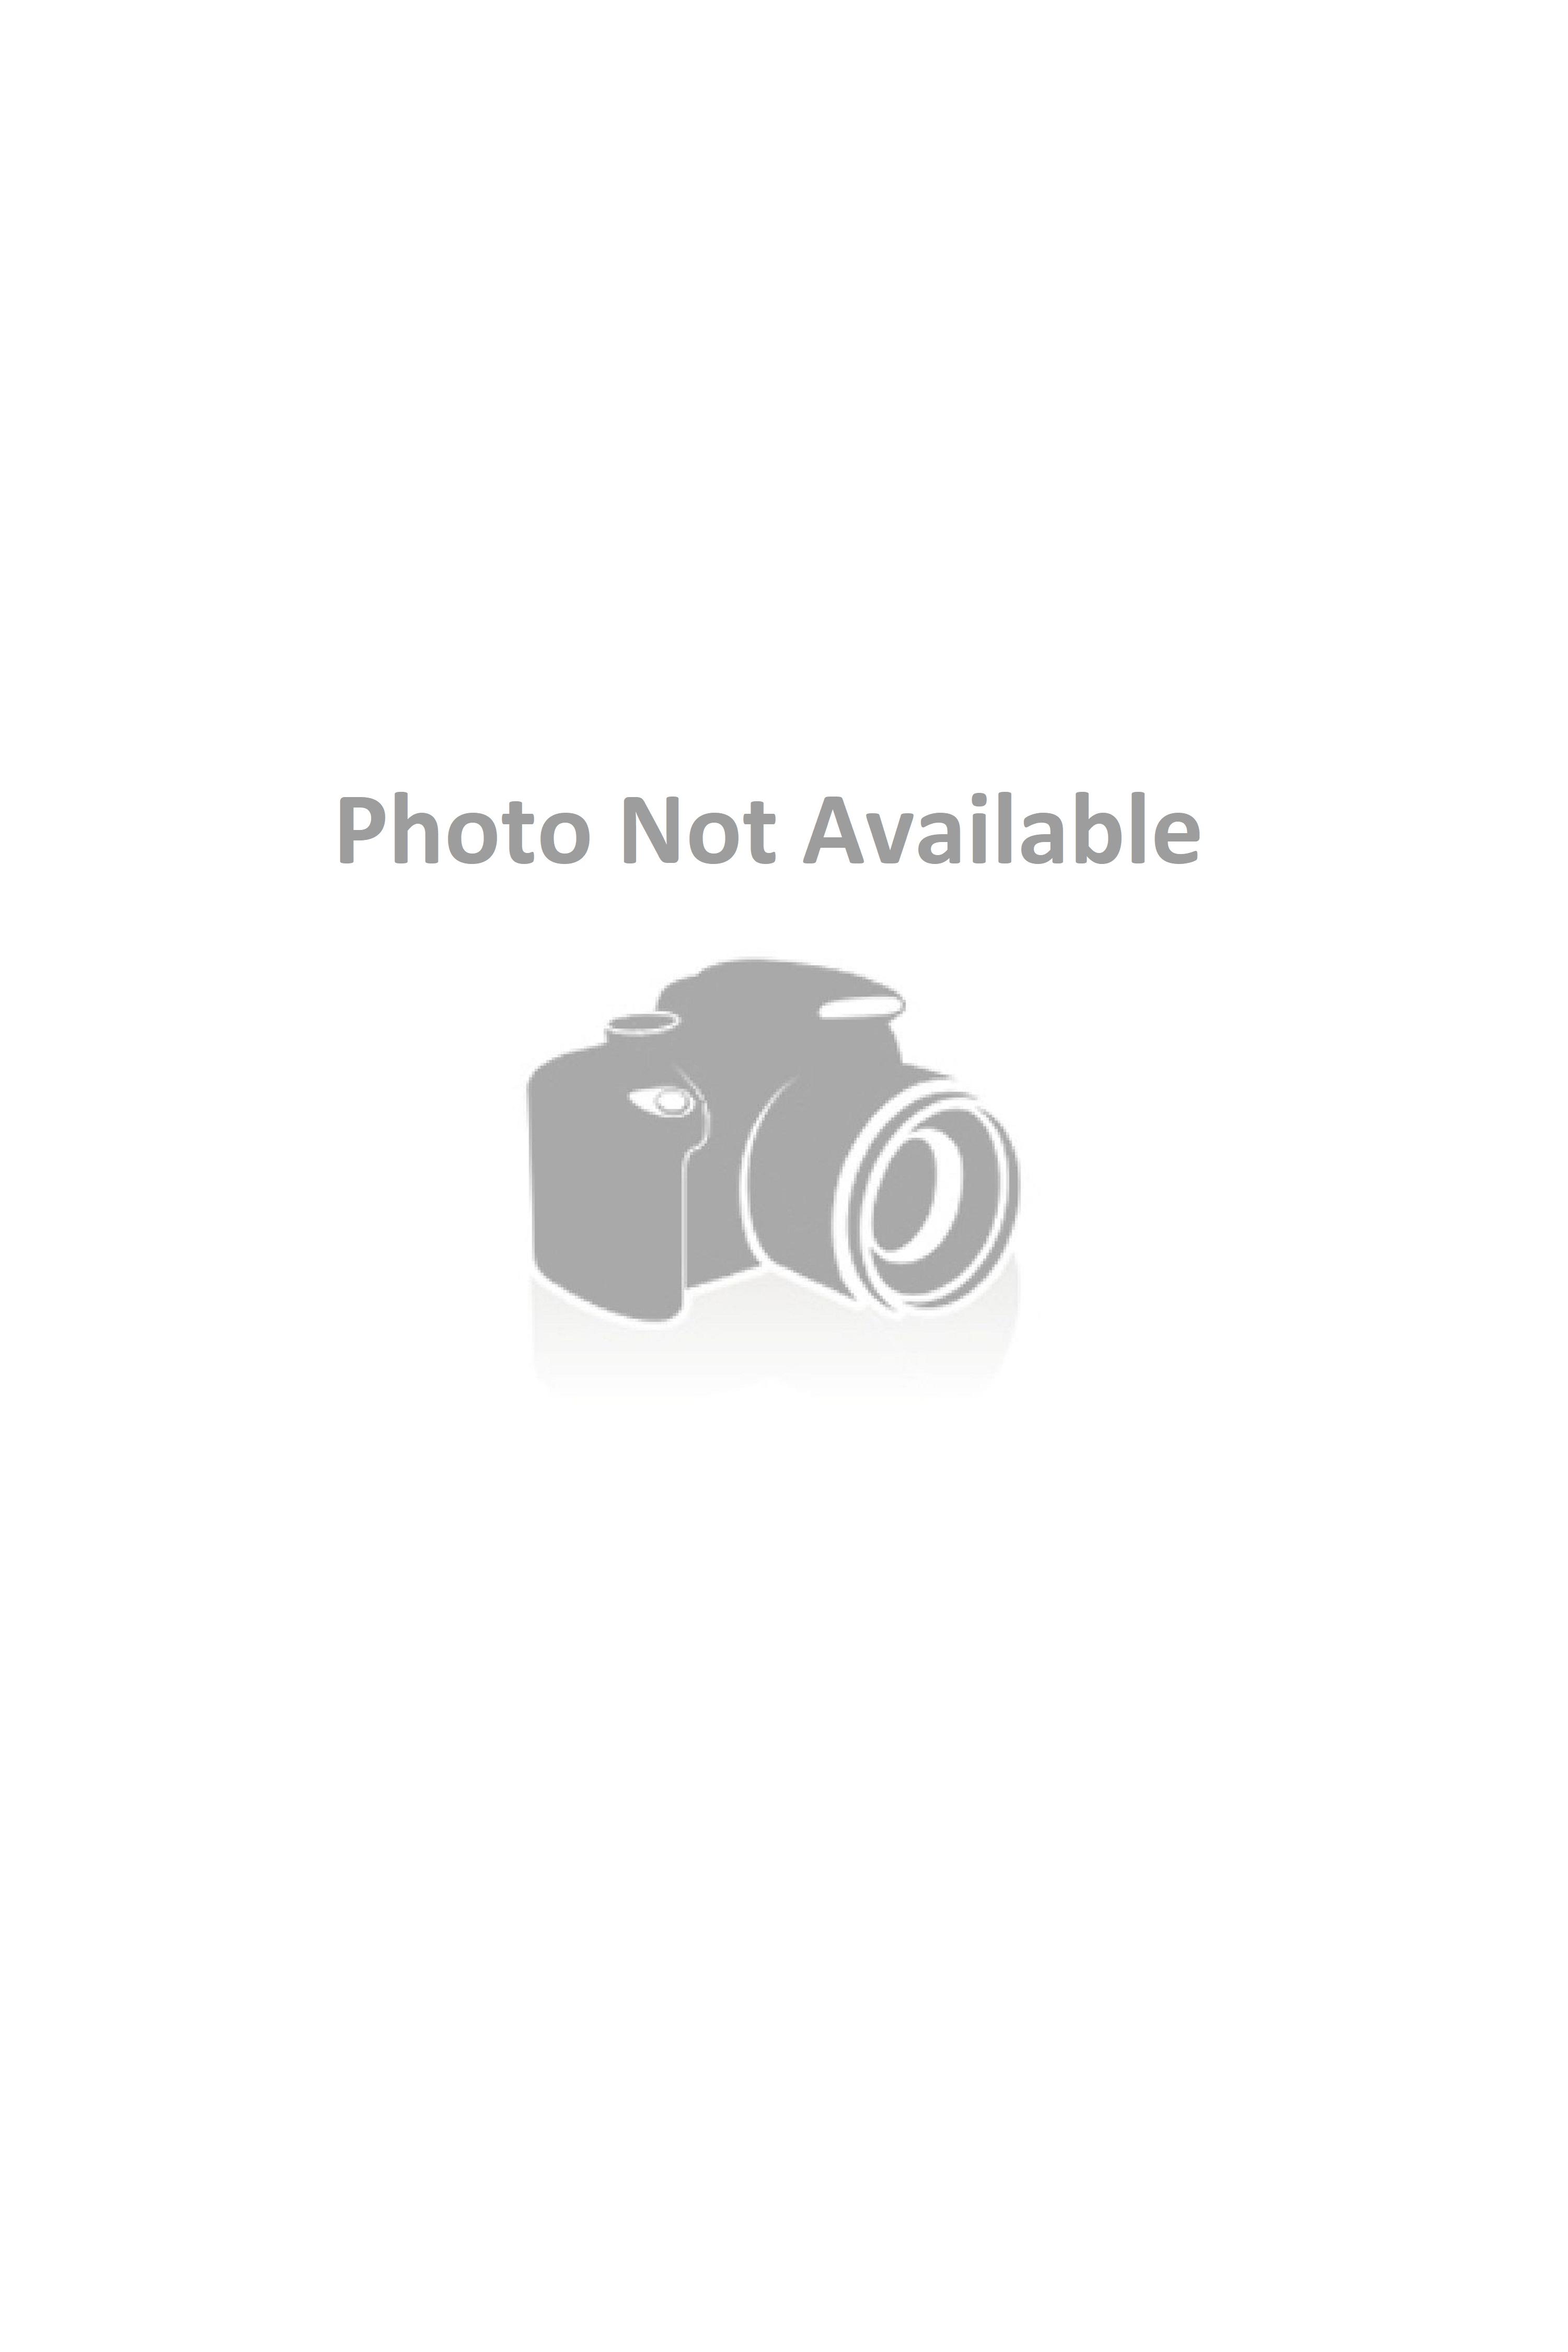 Batik ♦ ♦ AKH Fashion Long*Shirt EG 46,48,50,52,54,56 sw-blau-grau-weiß-grün